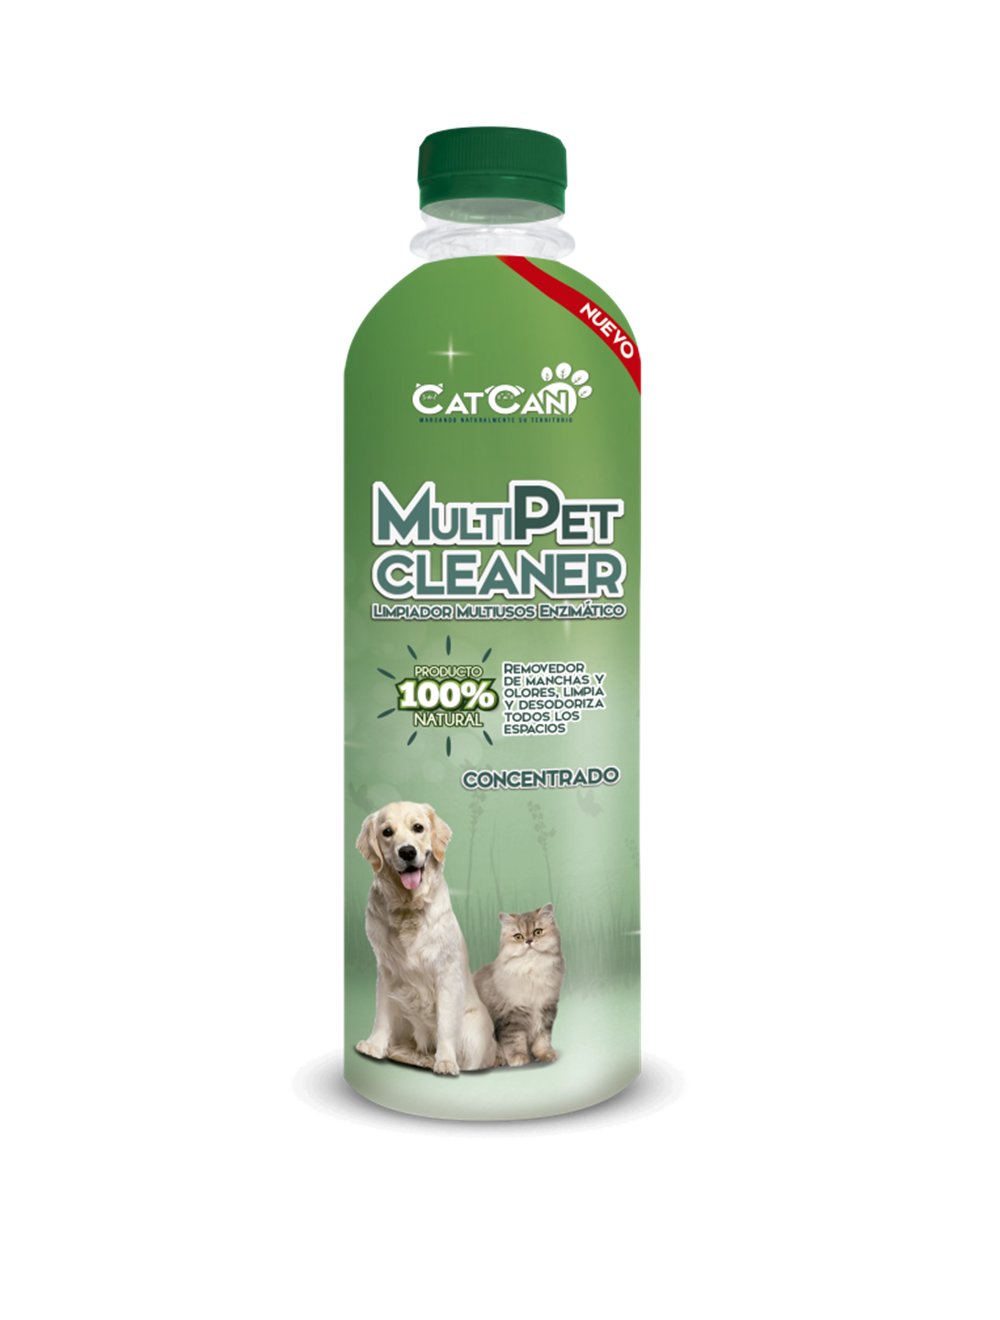 Cat Can Multipet Cleaner Concentrado-Ciudaddemascotas.com